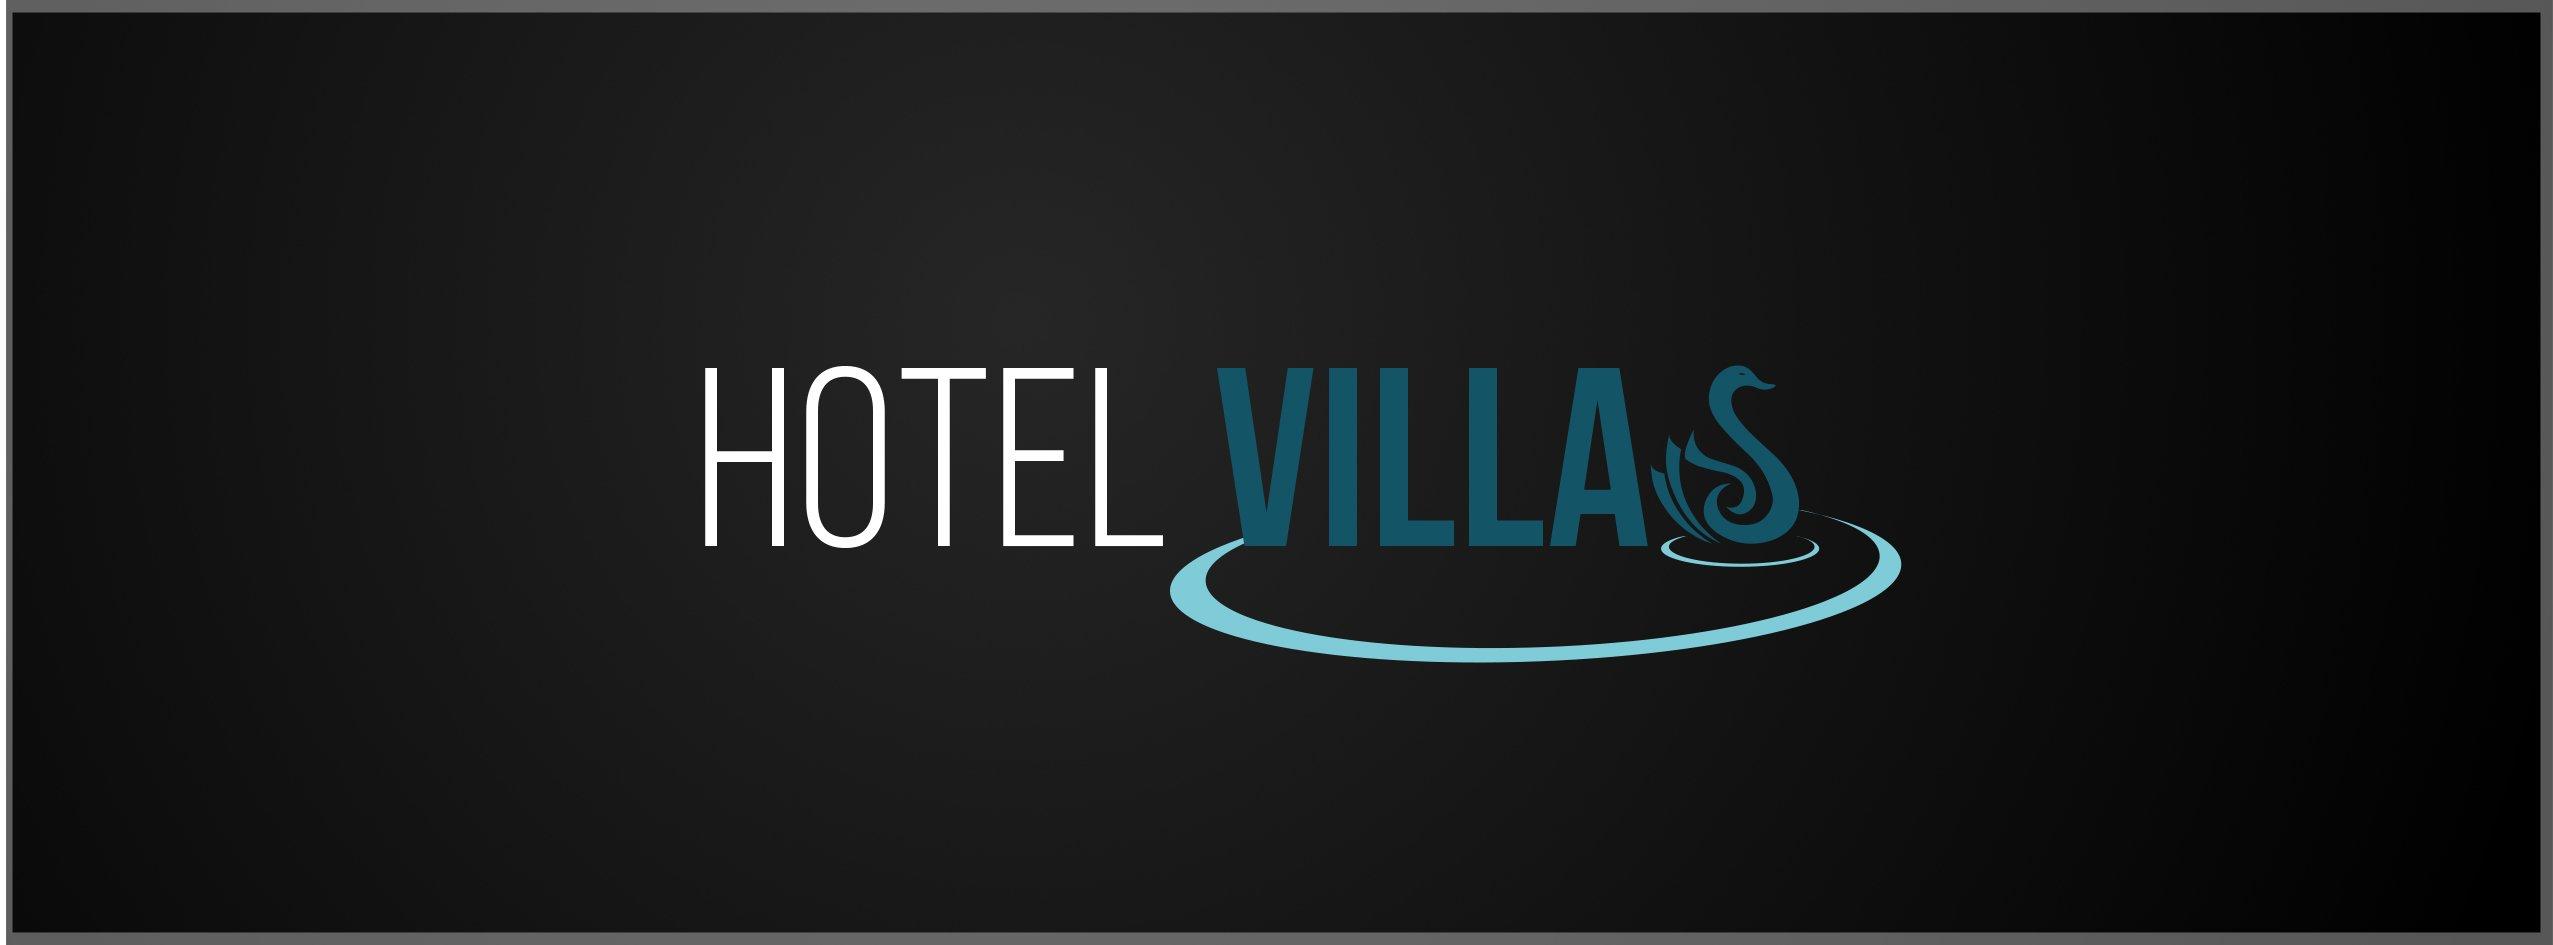 HOTELVİLLAS logo-3 white